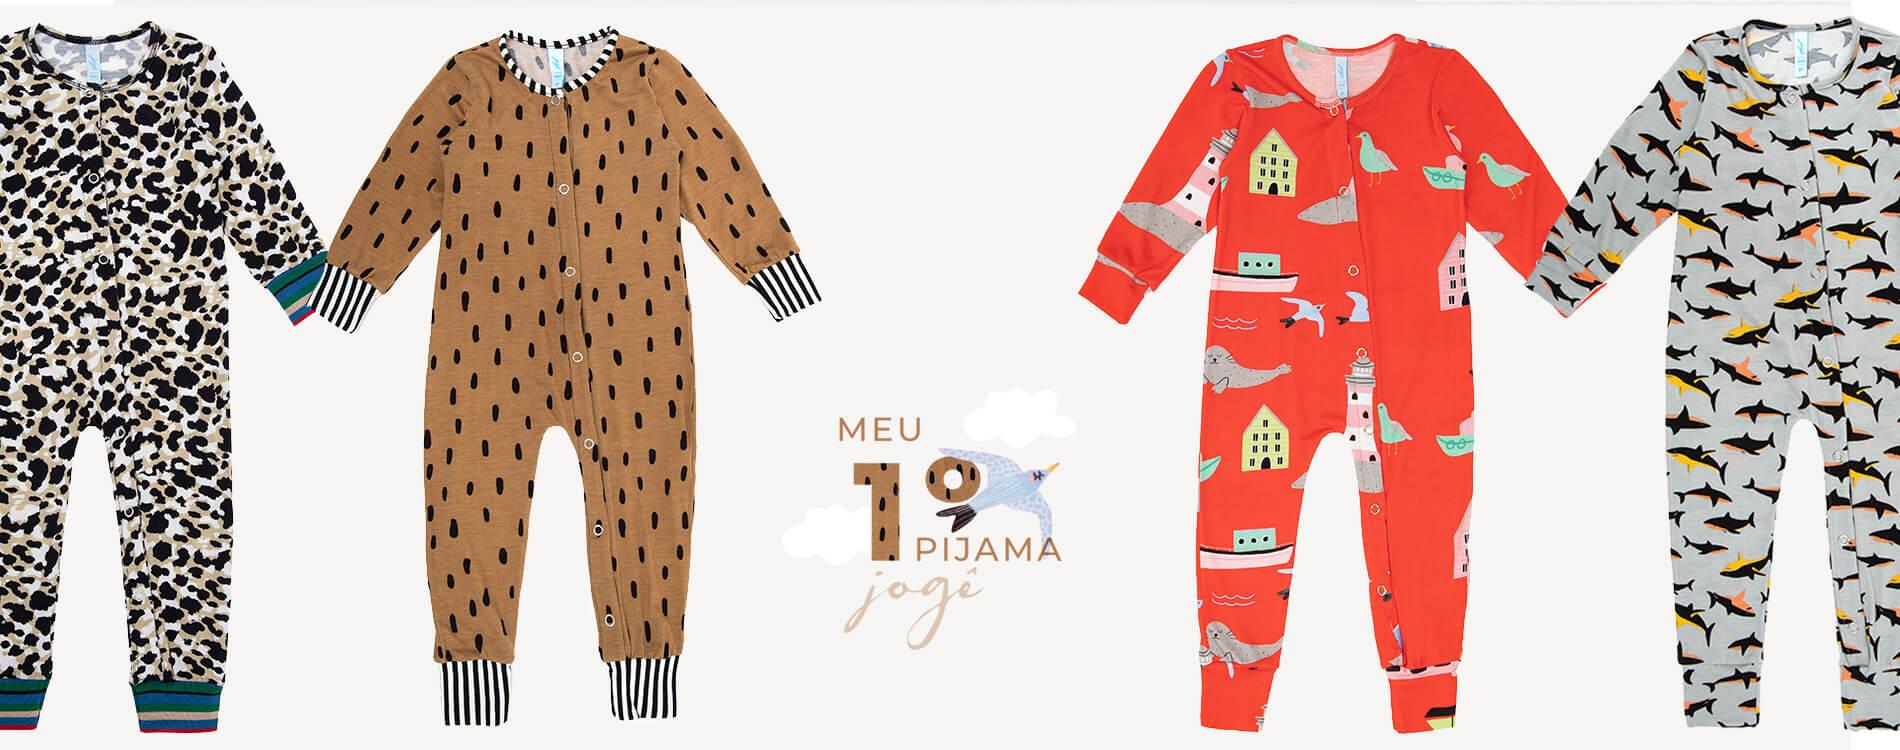 Meu primeiro pijama - trackEcommerce